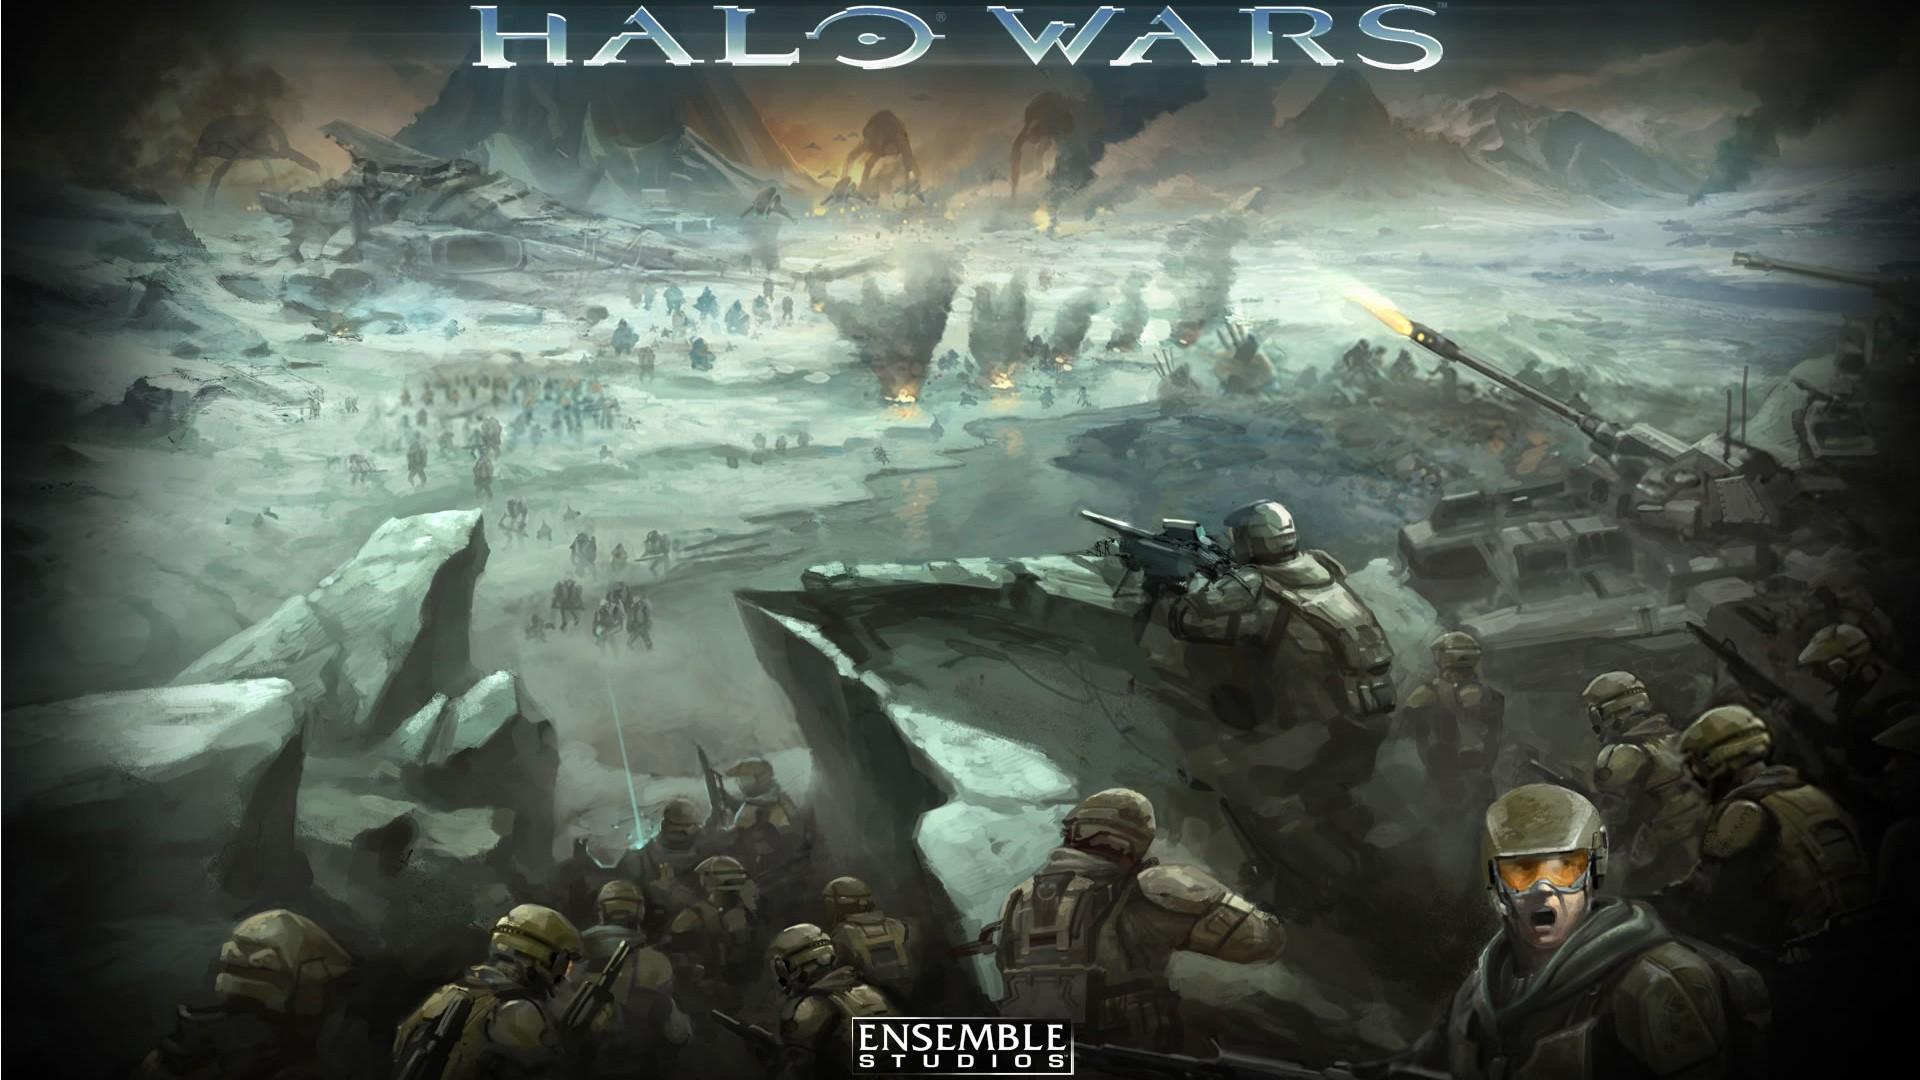 halo wars hd wallpaper | background image | 1920x1080 | id:577149